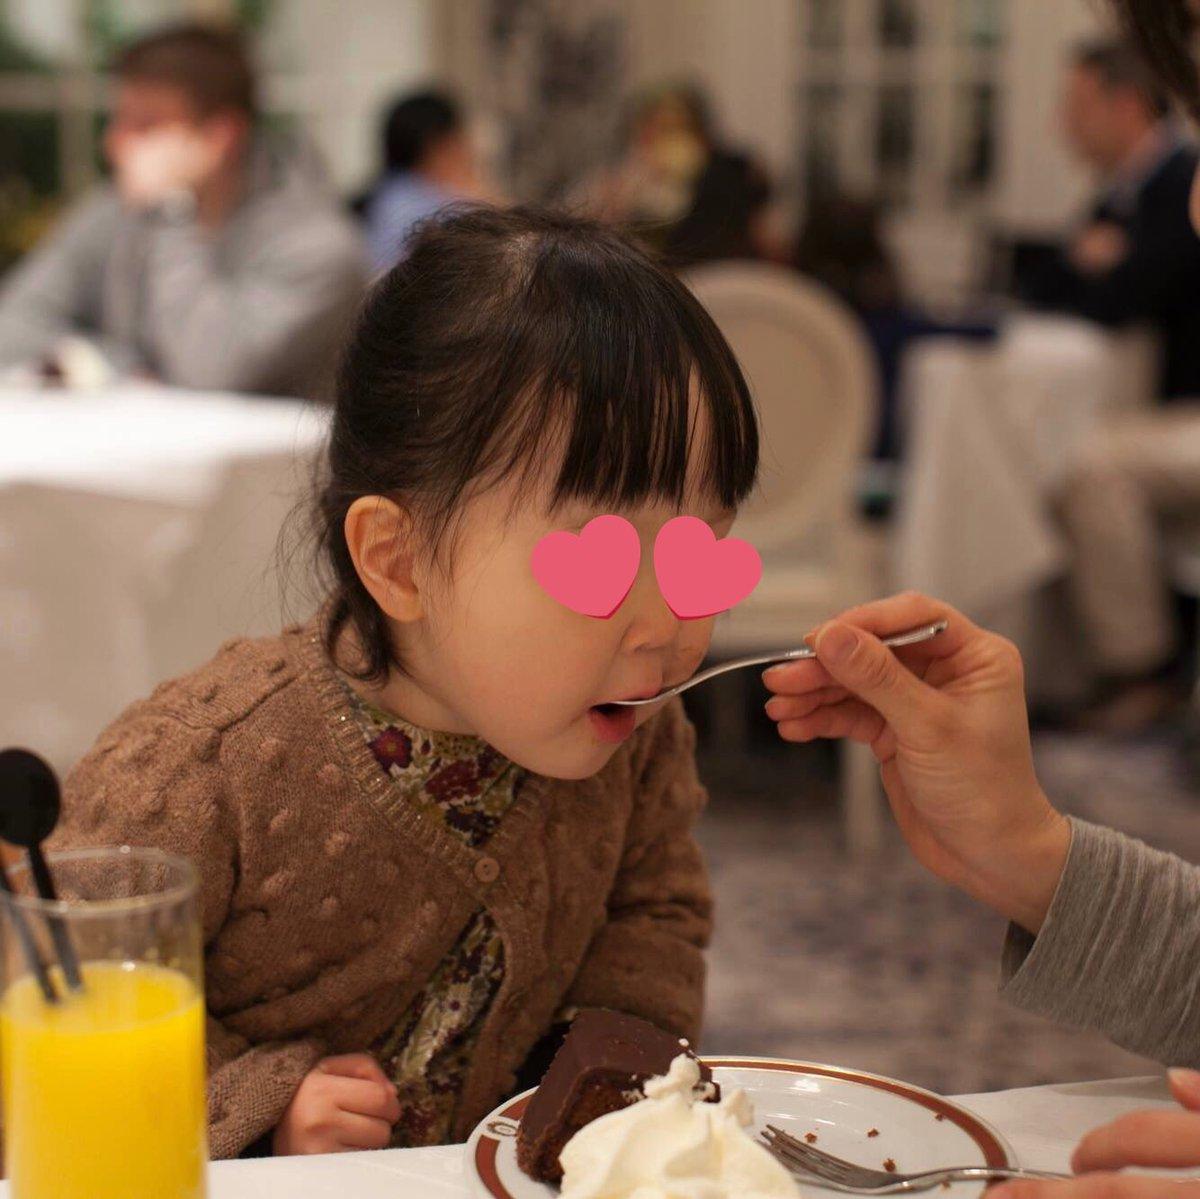 test ツイッターメディア - デメルとホテルザッハーのザッハトルテを食べ比べる娘ちゃん(当時2歳)。なんたる贅沢… https://t.co/NrvPerzfiC